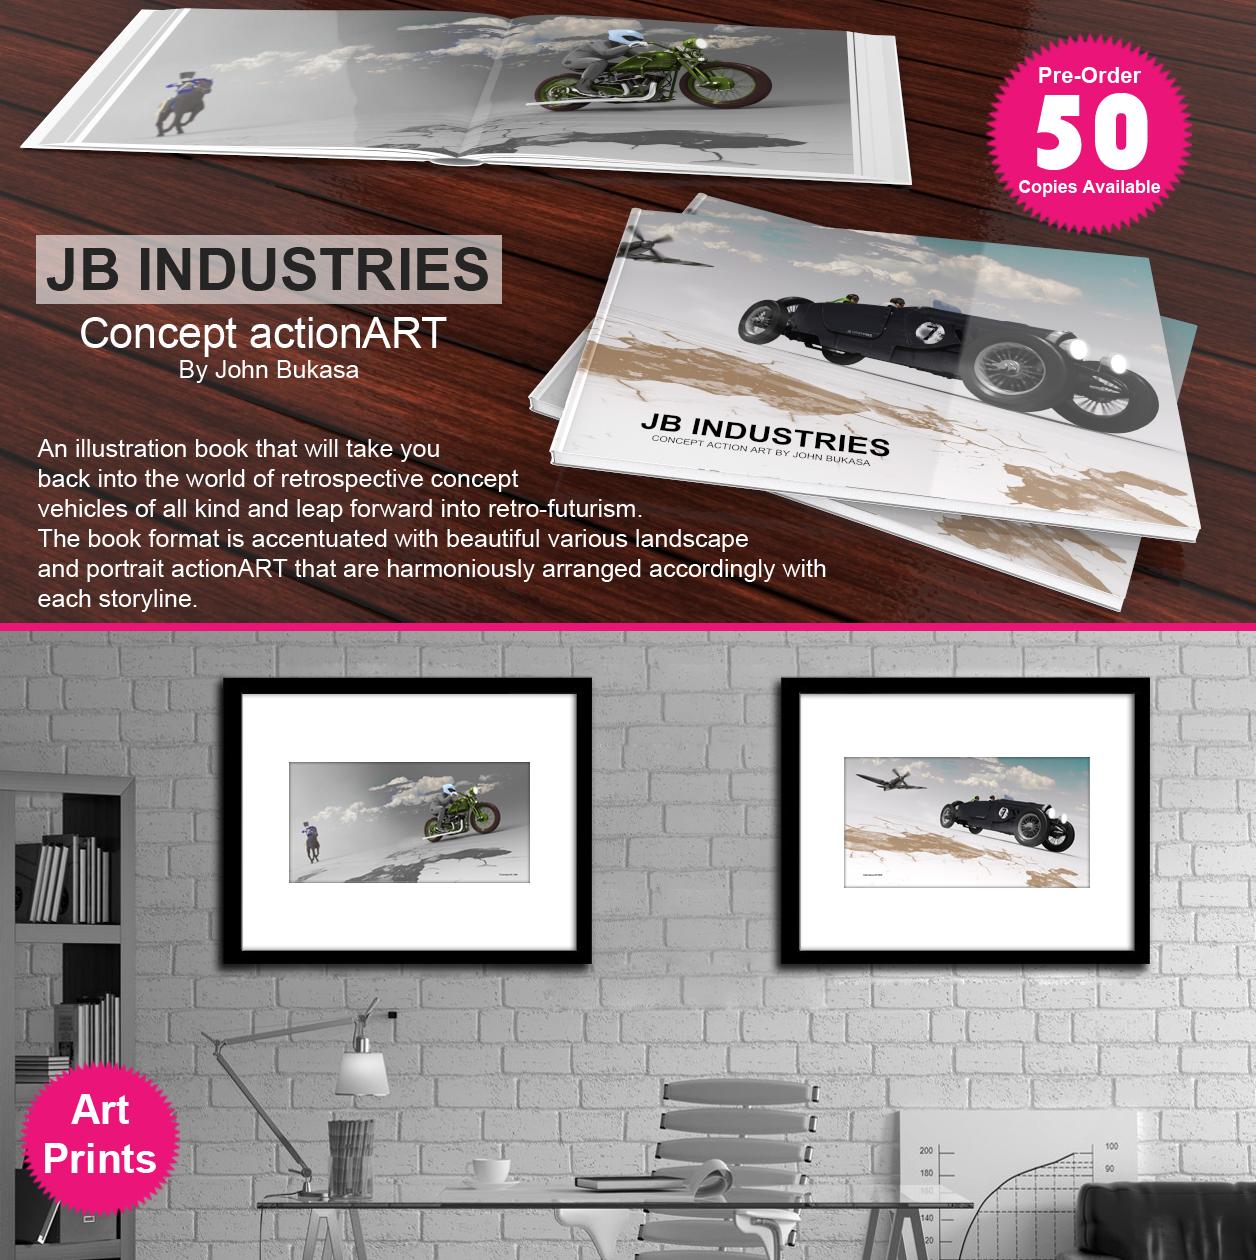 https://www.indiegogo.com/projects/jb-industries-visually-stunning-illustration-book-art-design#/